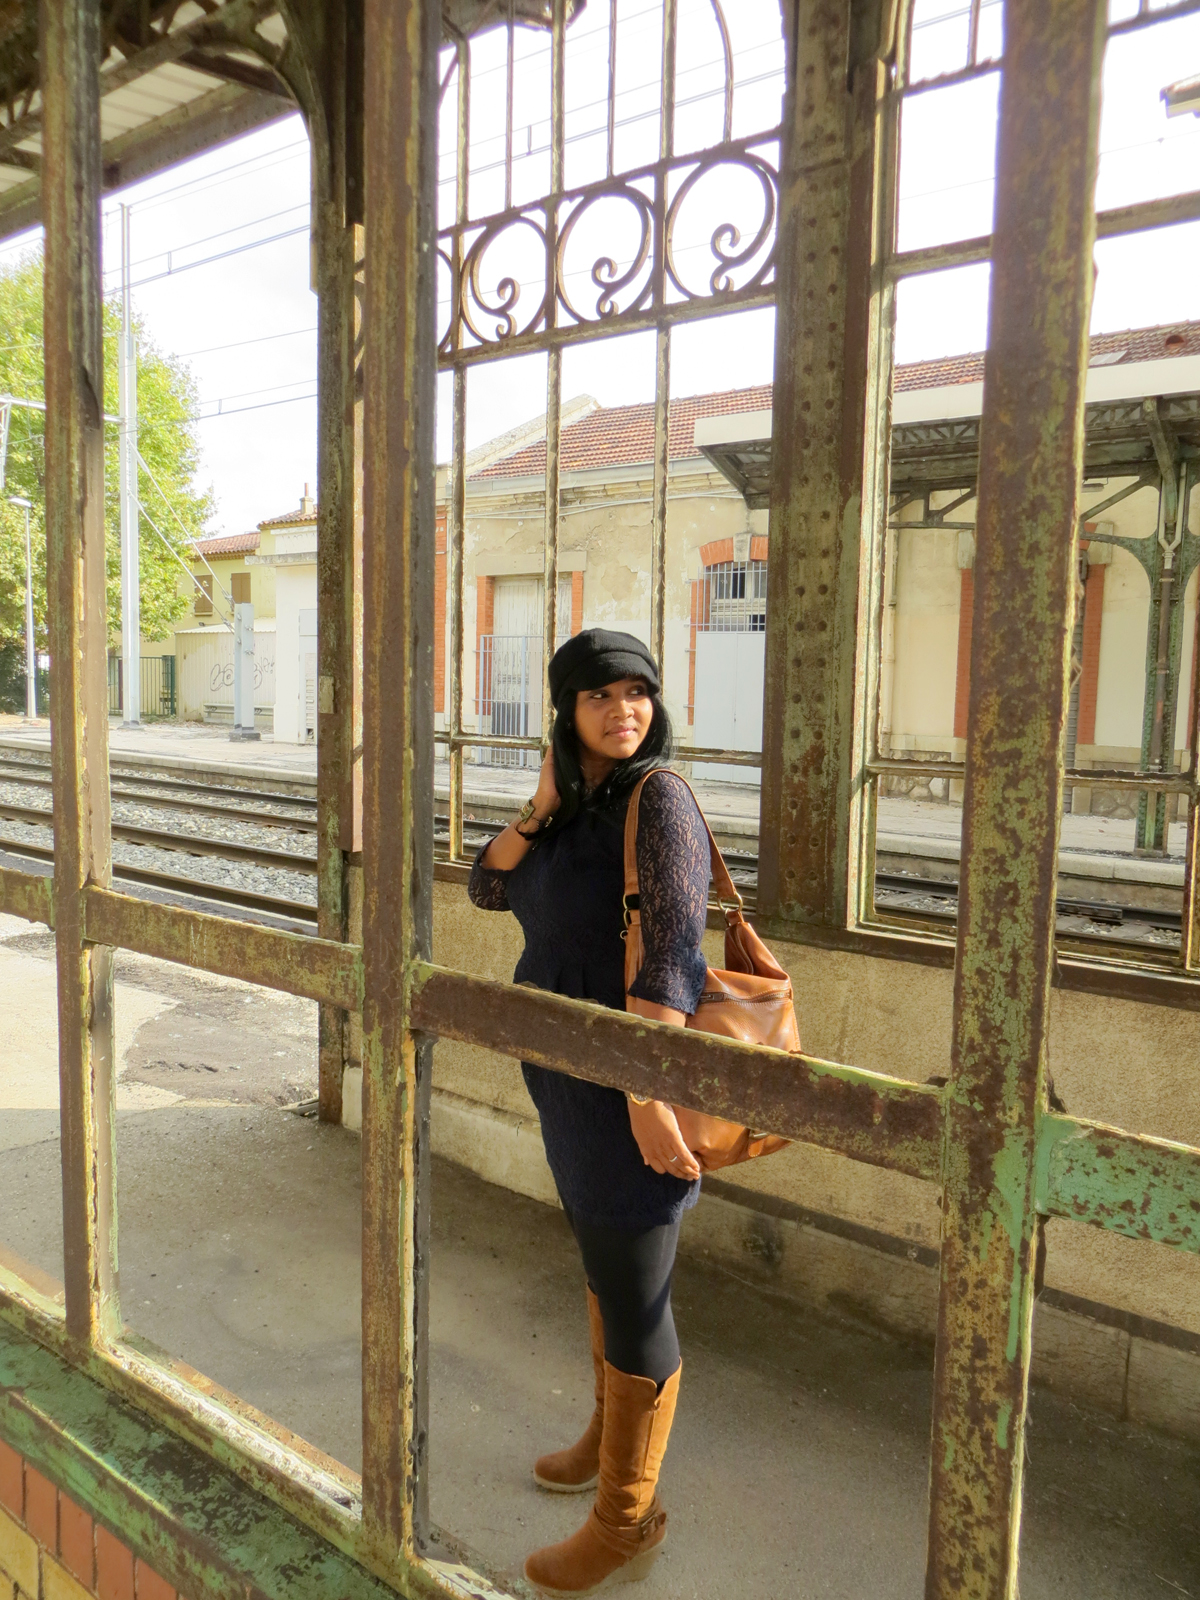 Hema_Waiting_for_the_train_C-Oui-Copenhague10